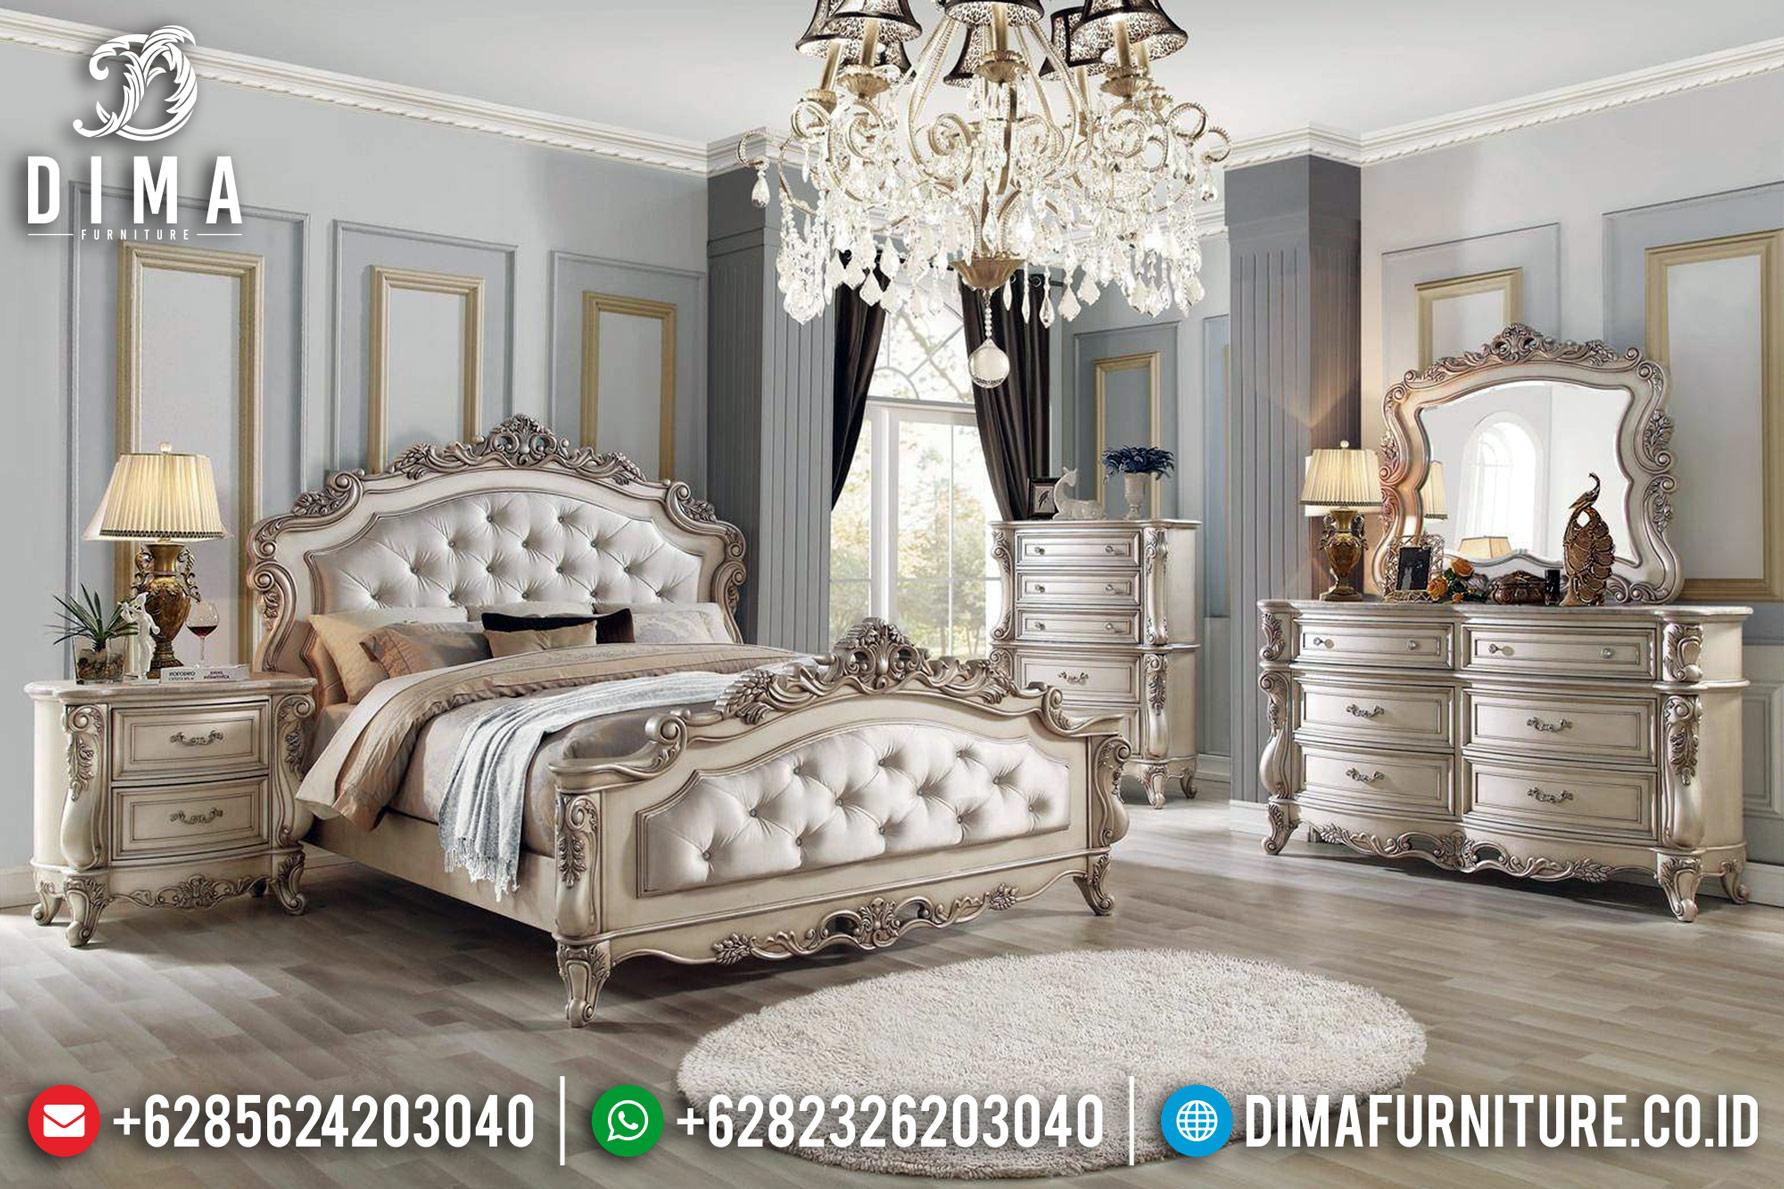 Art Design Tempat Tidur Mewah White Ivory Duco Champagne Shadow Furniture Jepara Luxury TTJ-0464